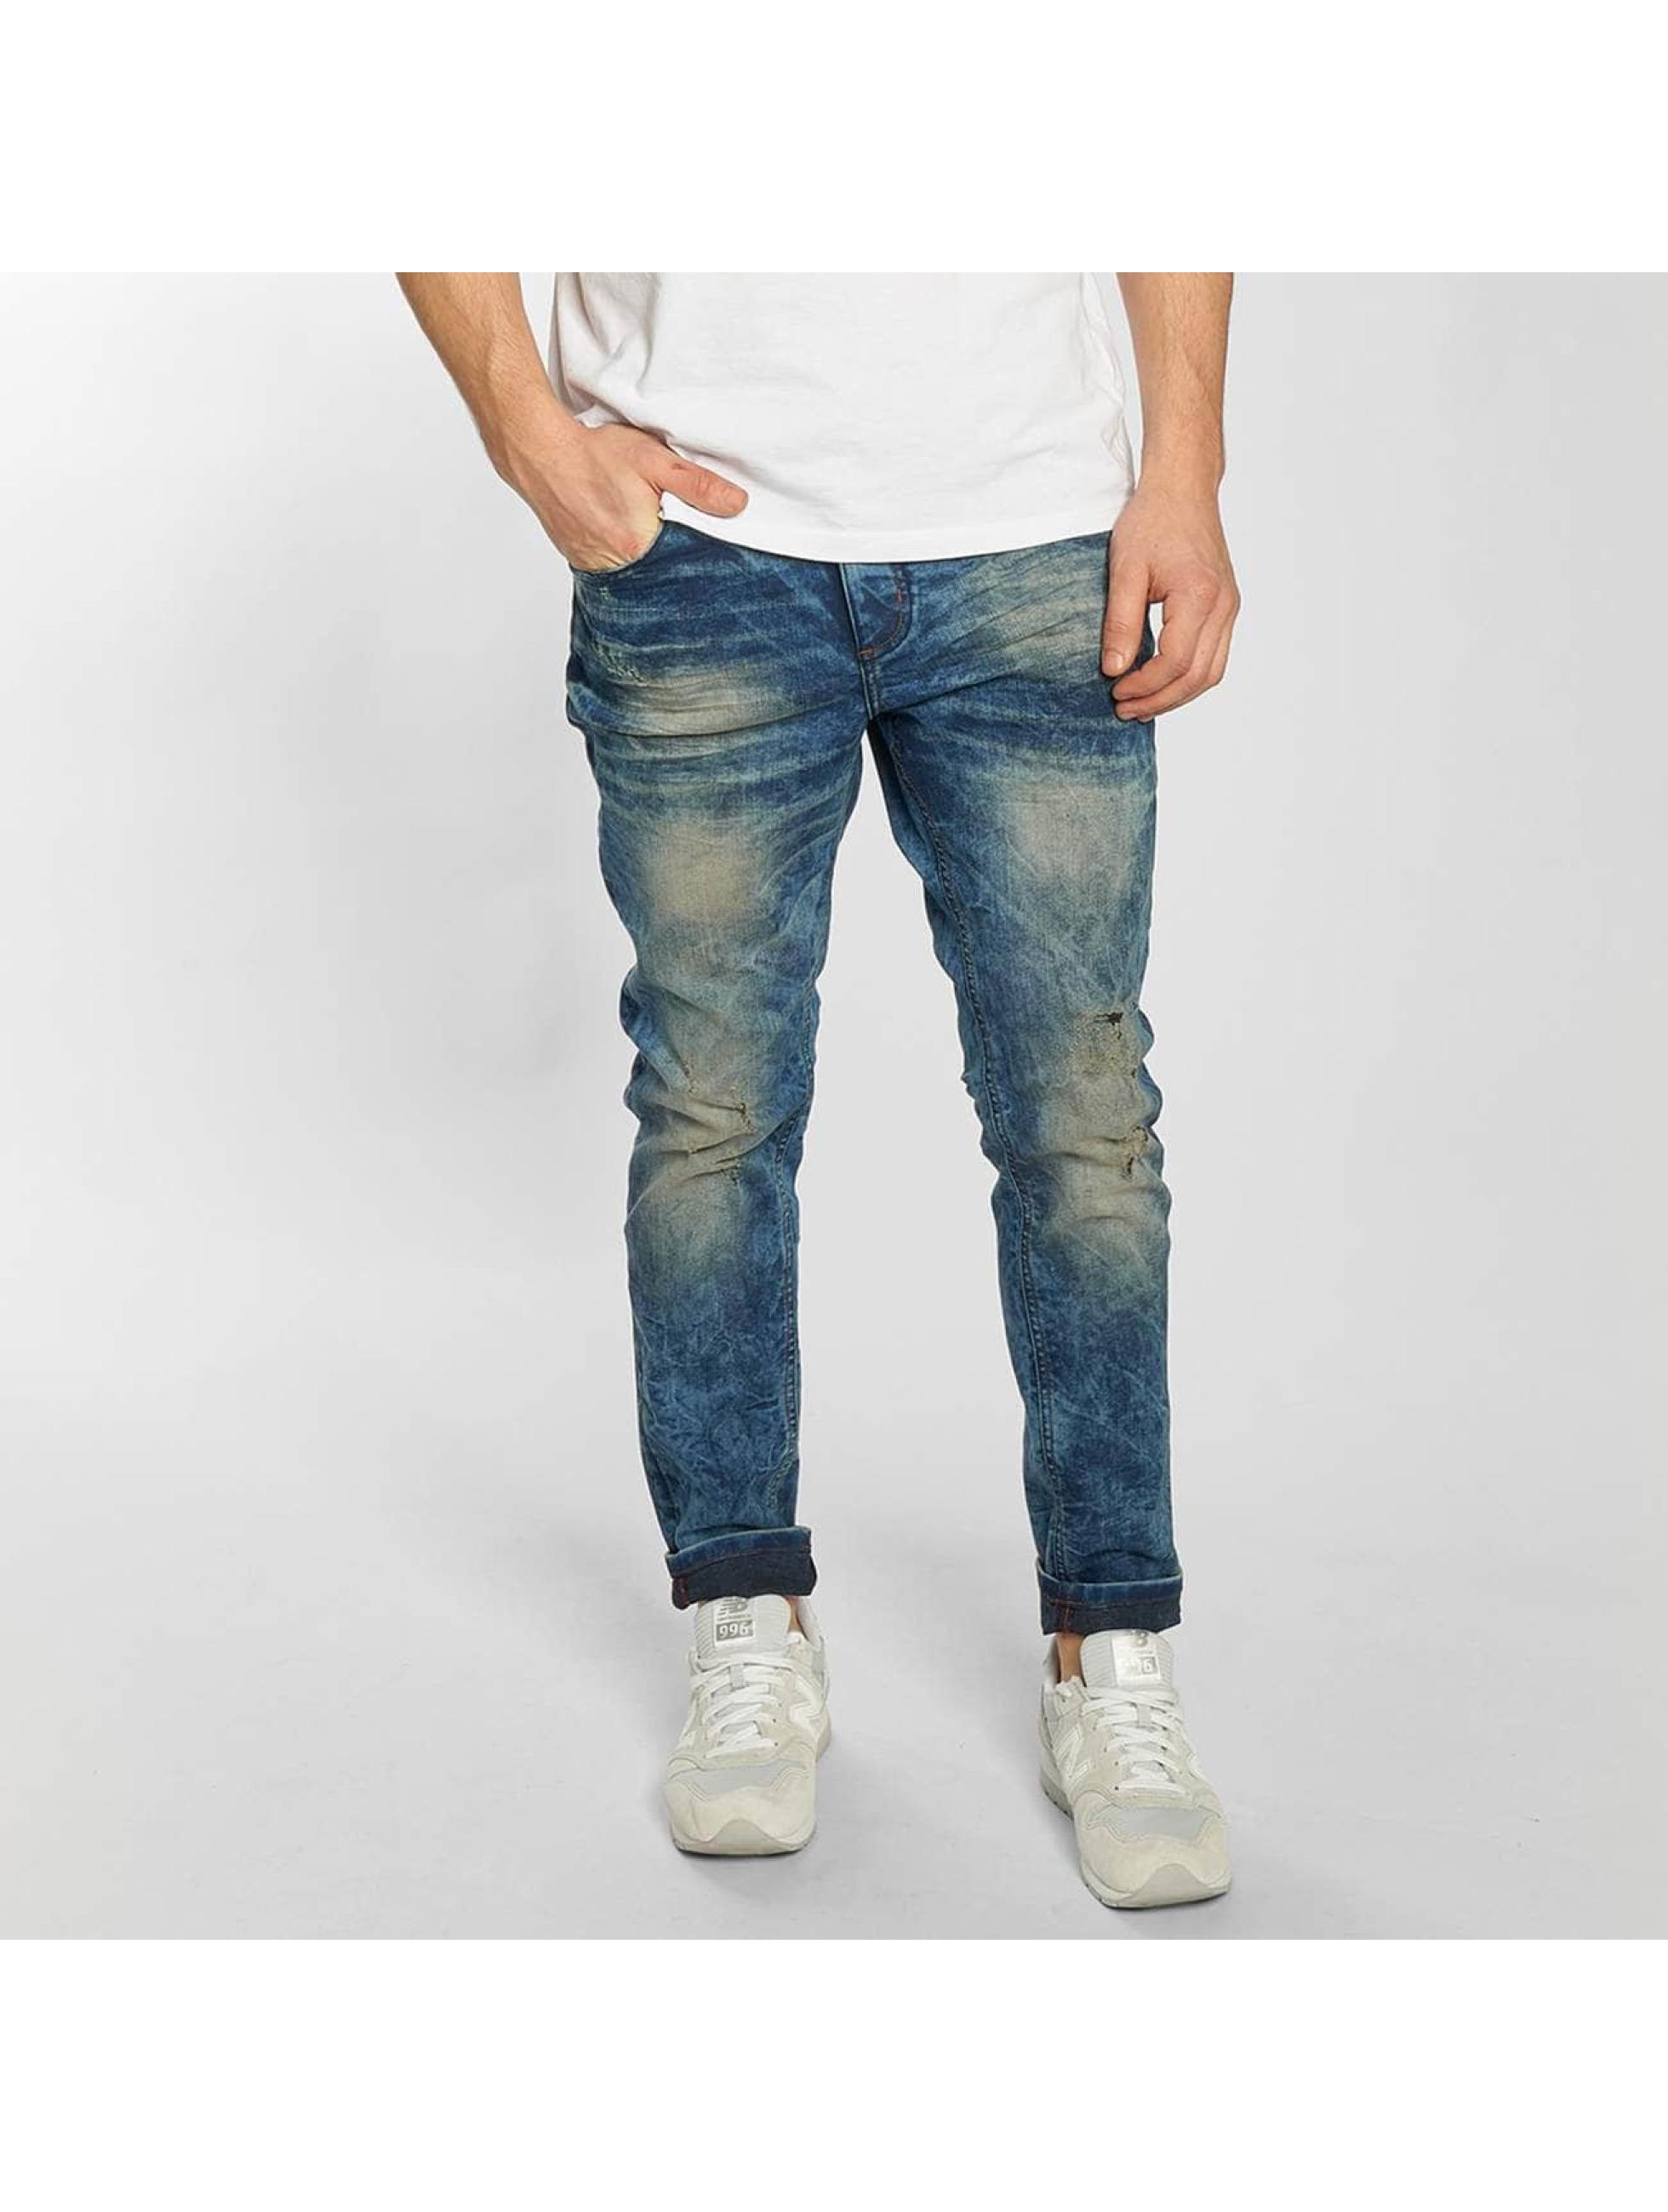 SHINE Original Skinny Jeans Drop Crotch blau